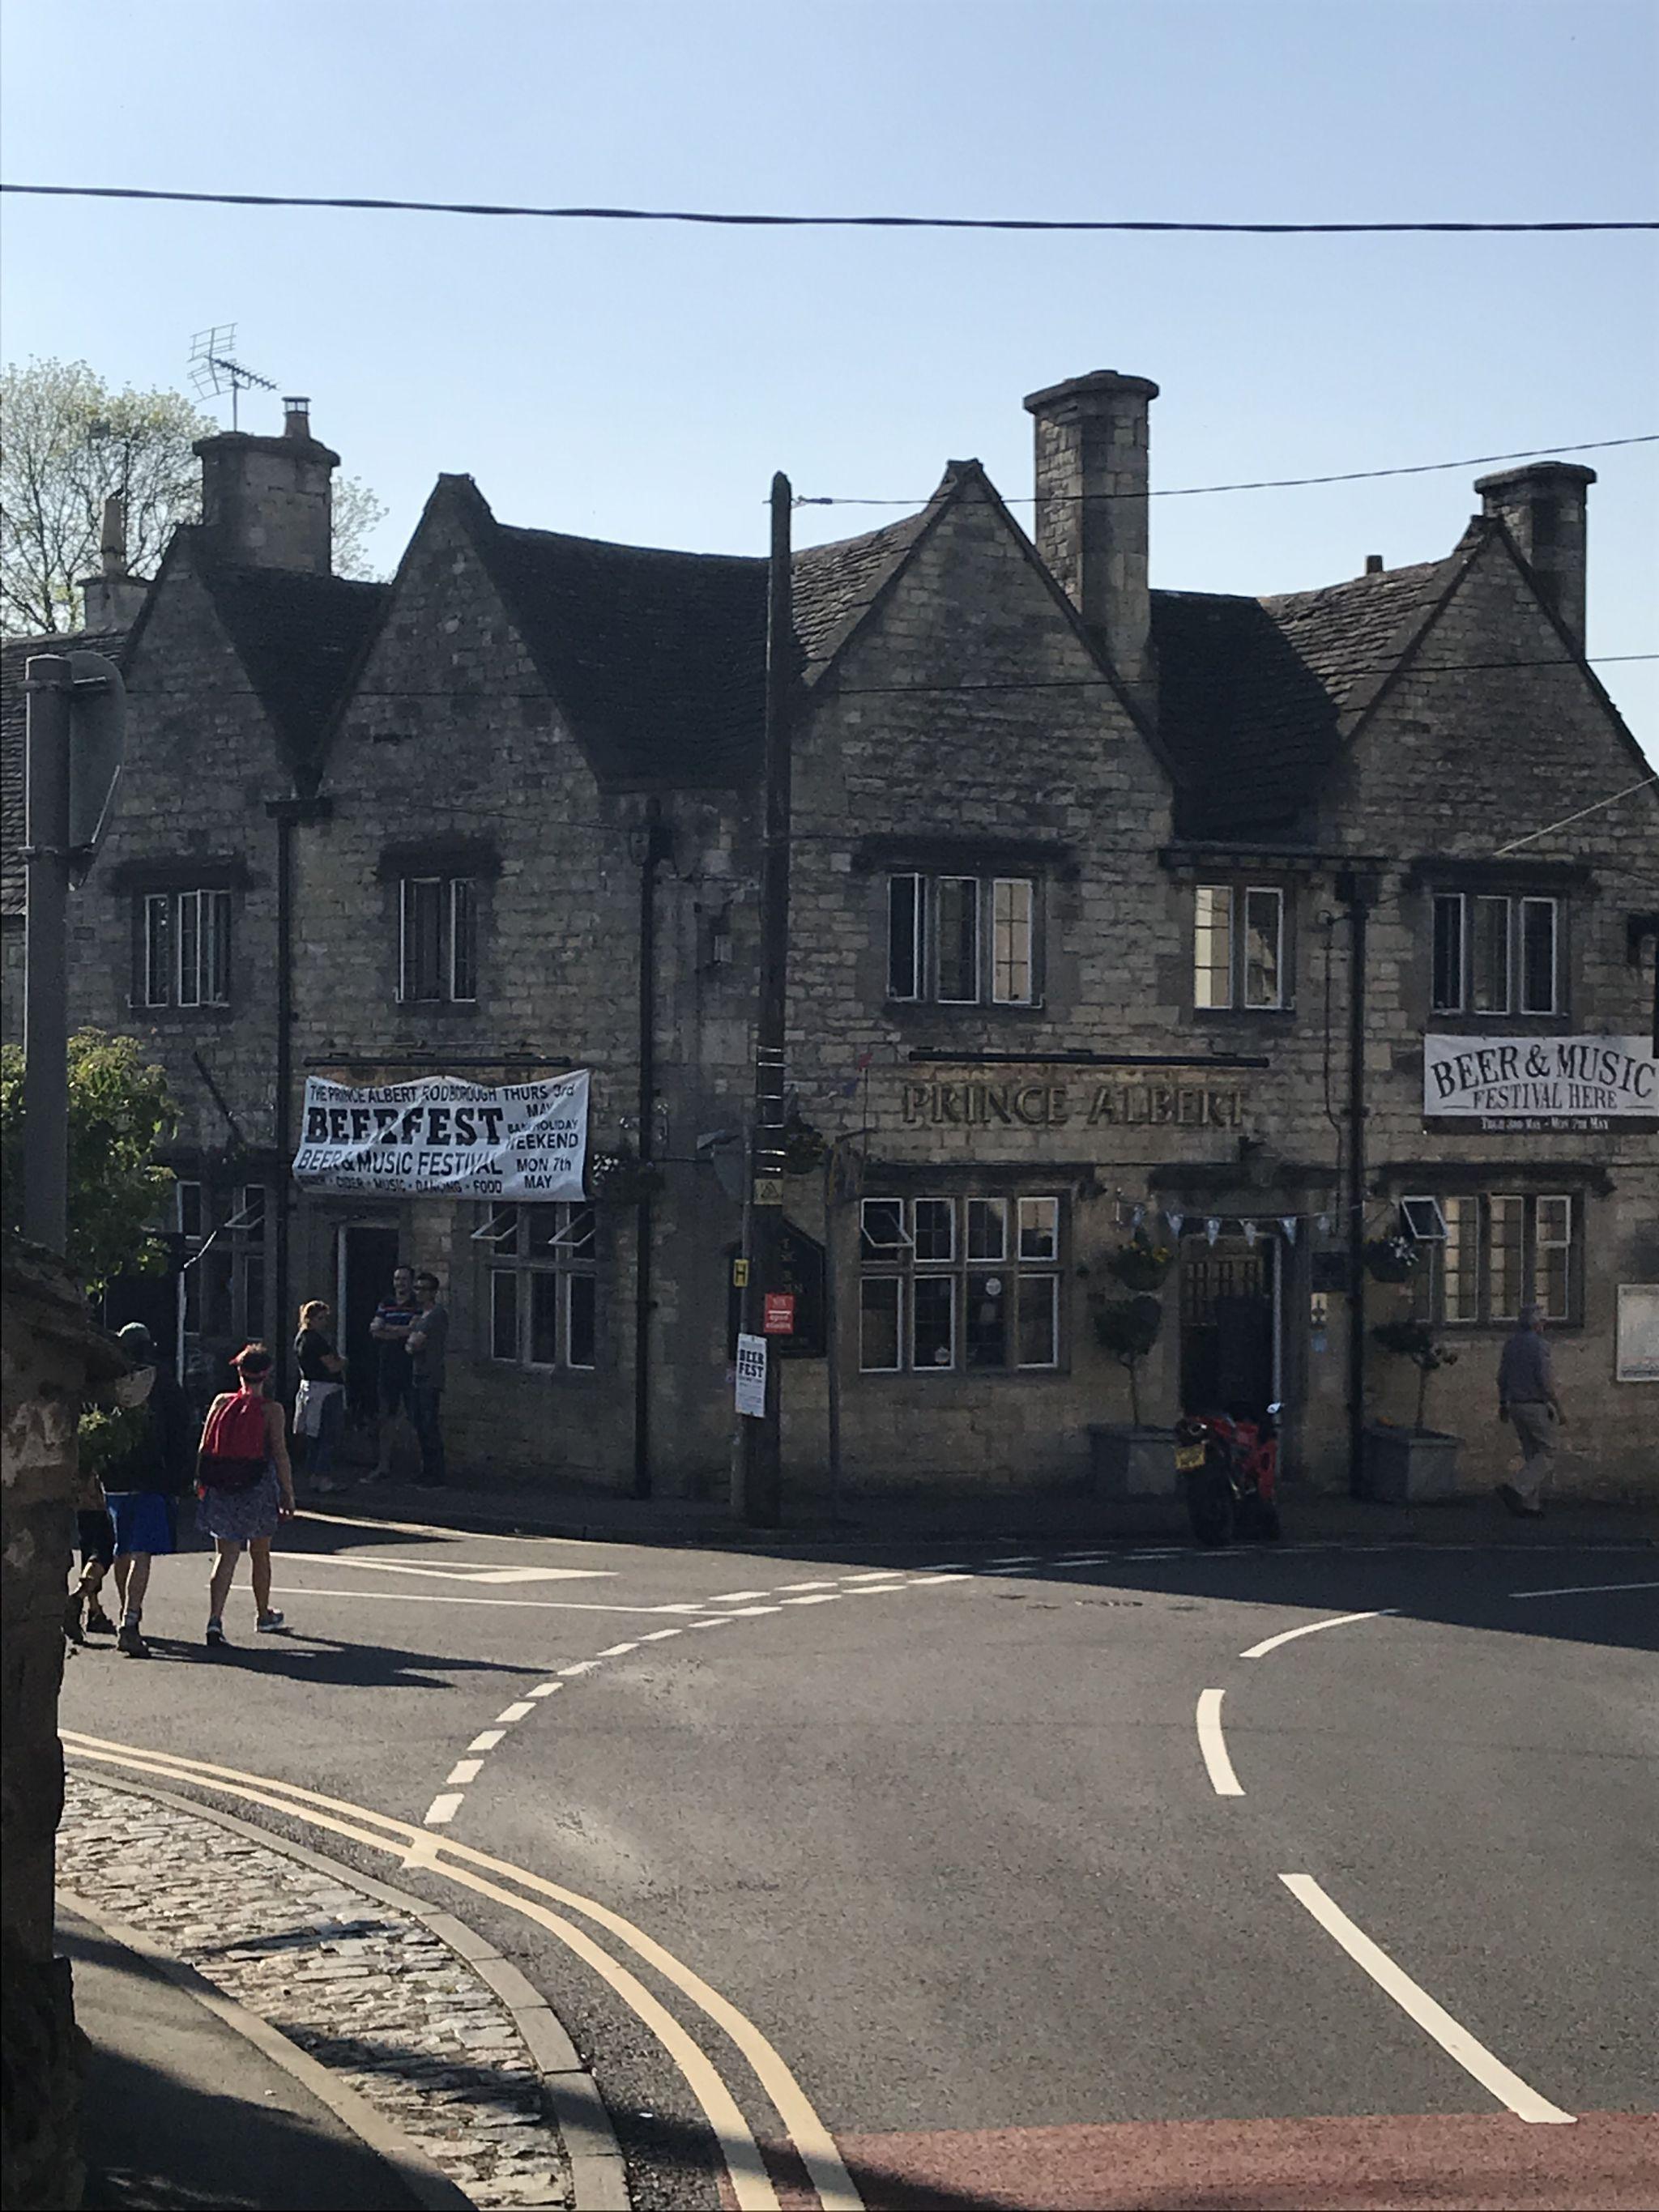 Prince Albert Pub Stroud